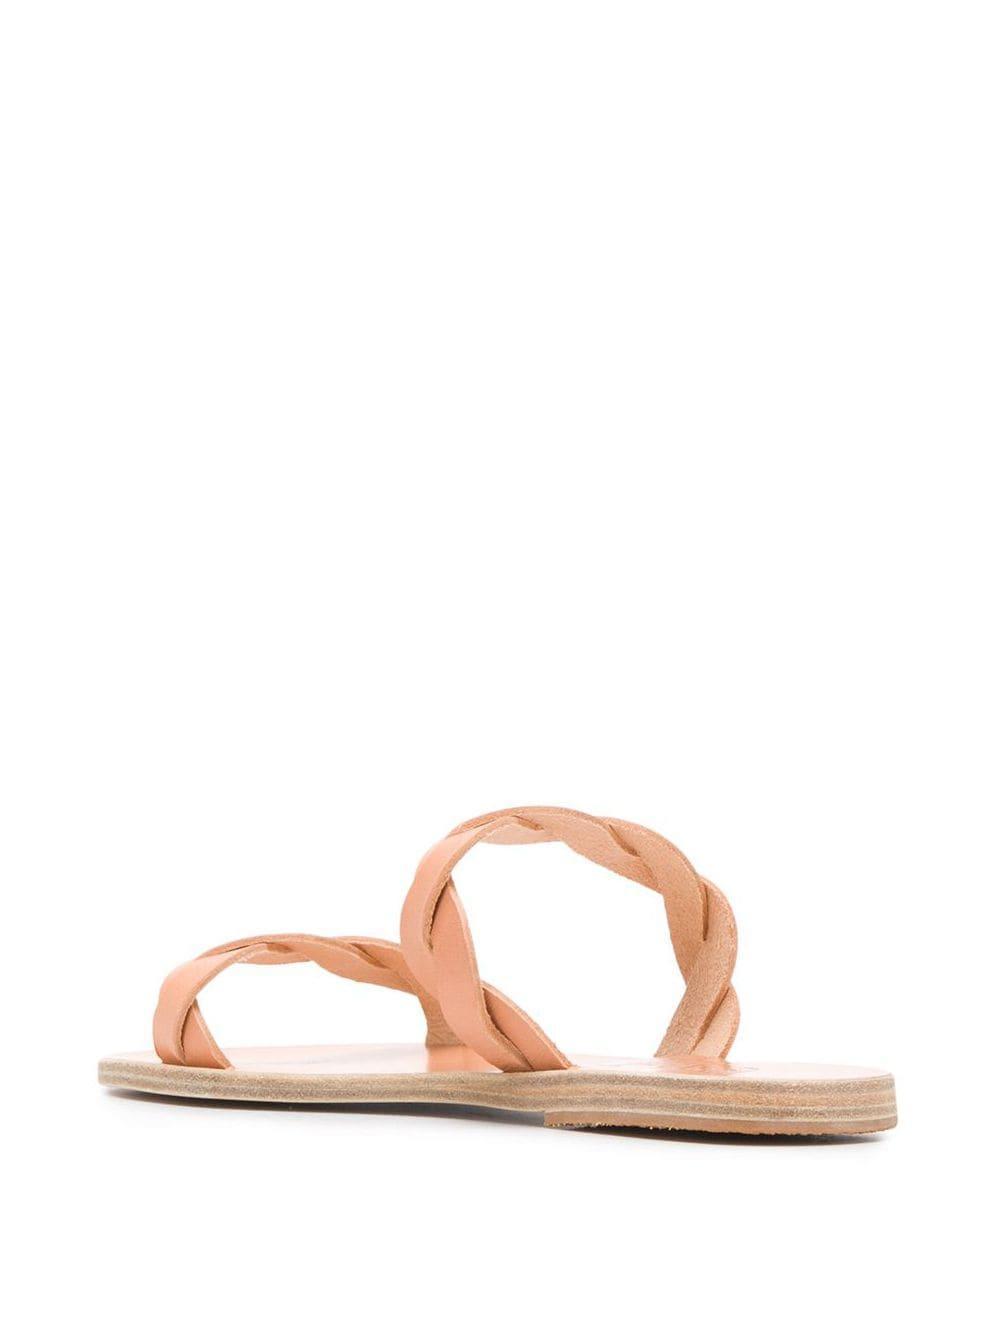 Sandales Skiriani Cuir Ancient Greek Sandals en coloris Rose